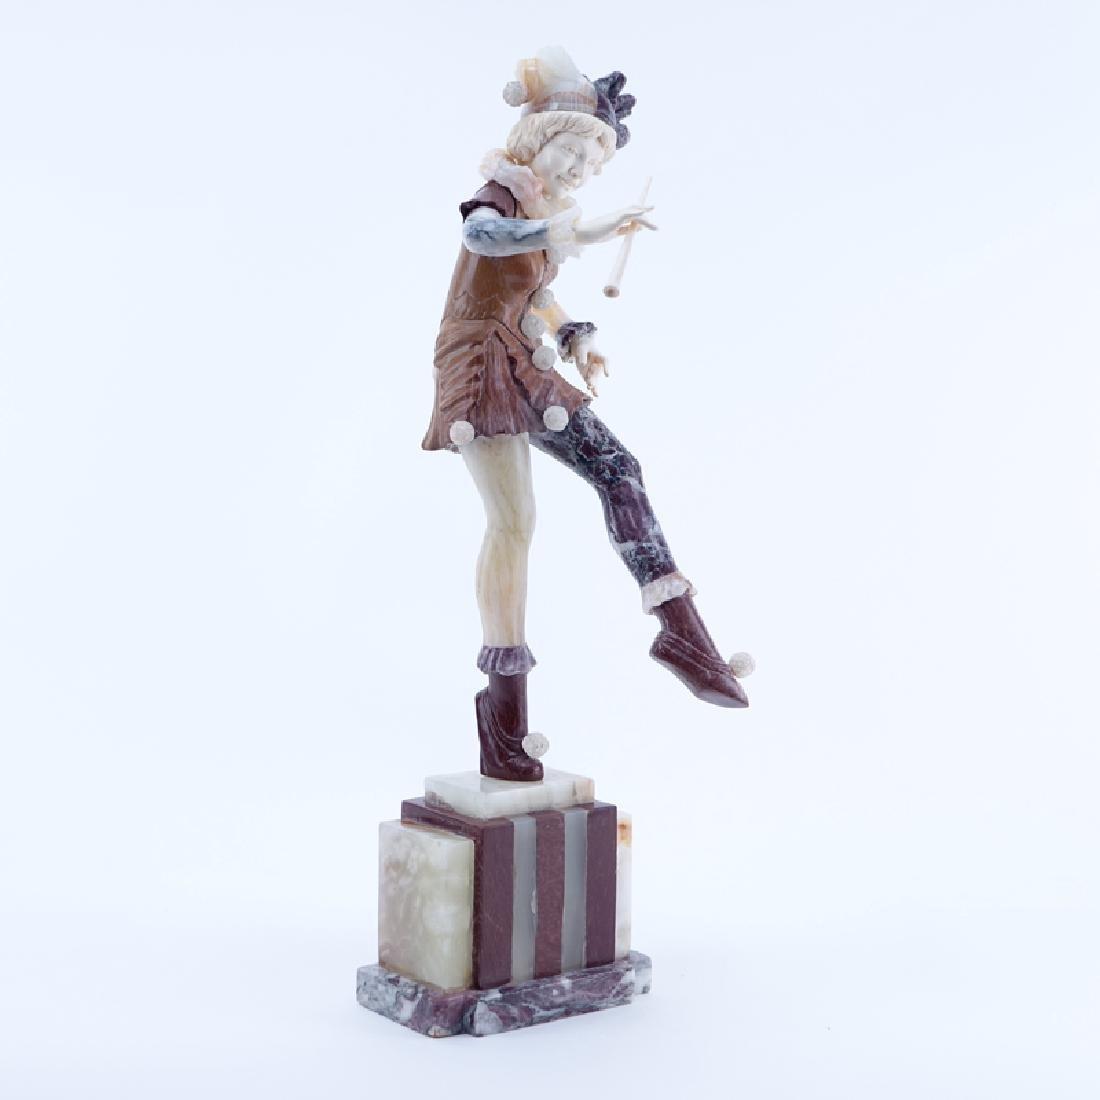 Antique Art Deco Marble, Onyx Harlequin Sculpture. - 2